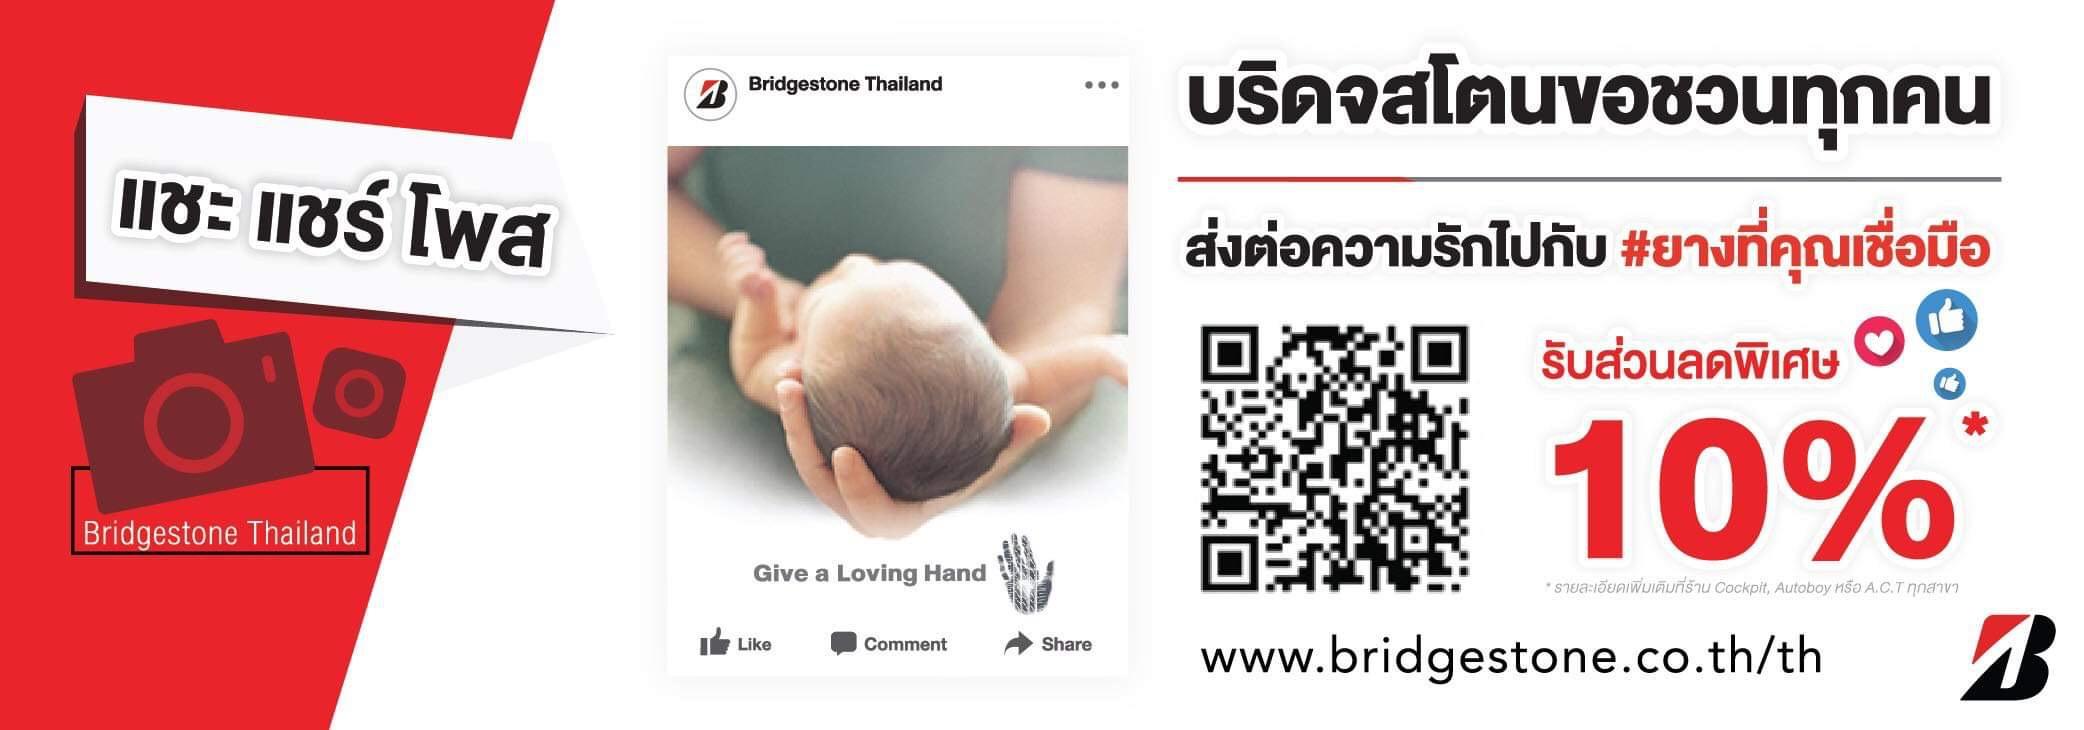 Give a Loving Hand,บริดจสโตน Give a Loving Hand,ยางที่คุณเชื่อมือ,ยางรถยนต์,ศูนย์บริการค็อกพิท,GiveALovingHand,BridgestoneThailand,ยางรถยนต์ Bridgestone,ส่วนลดยาง Bridgestone